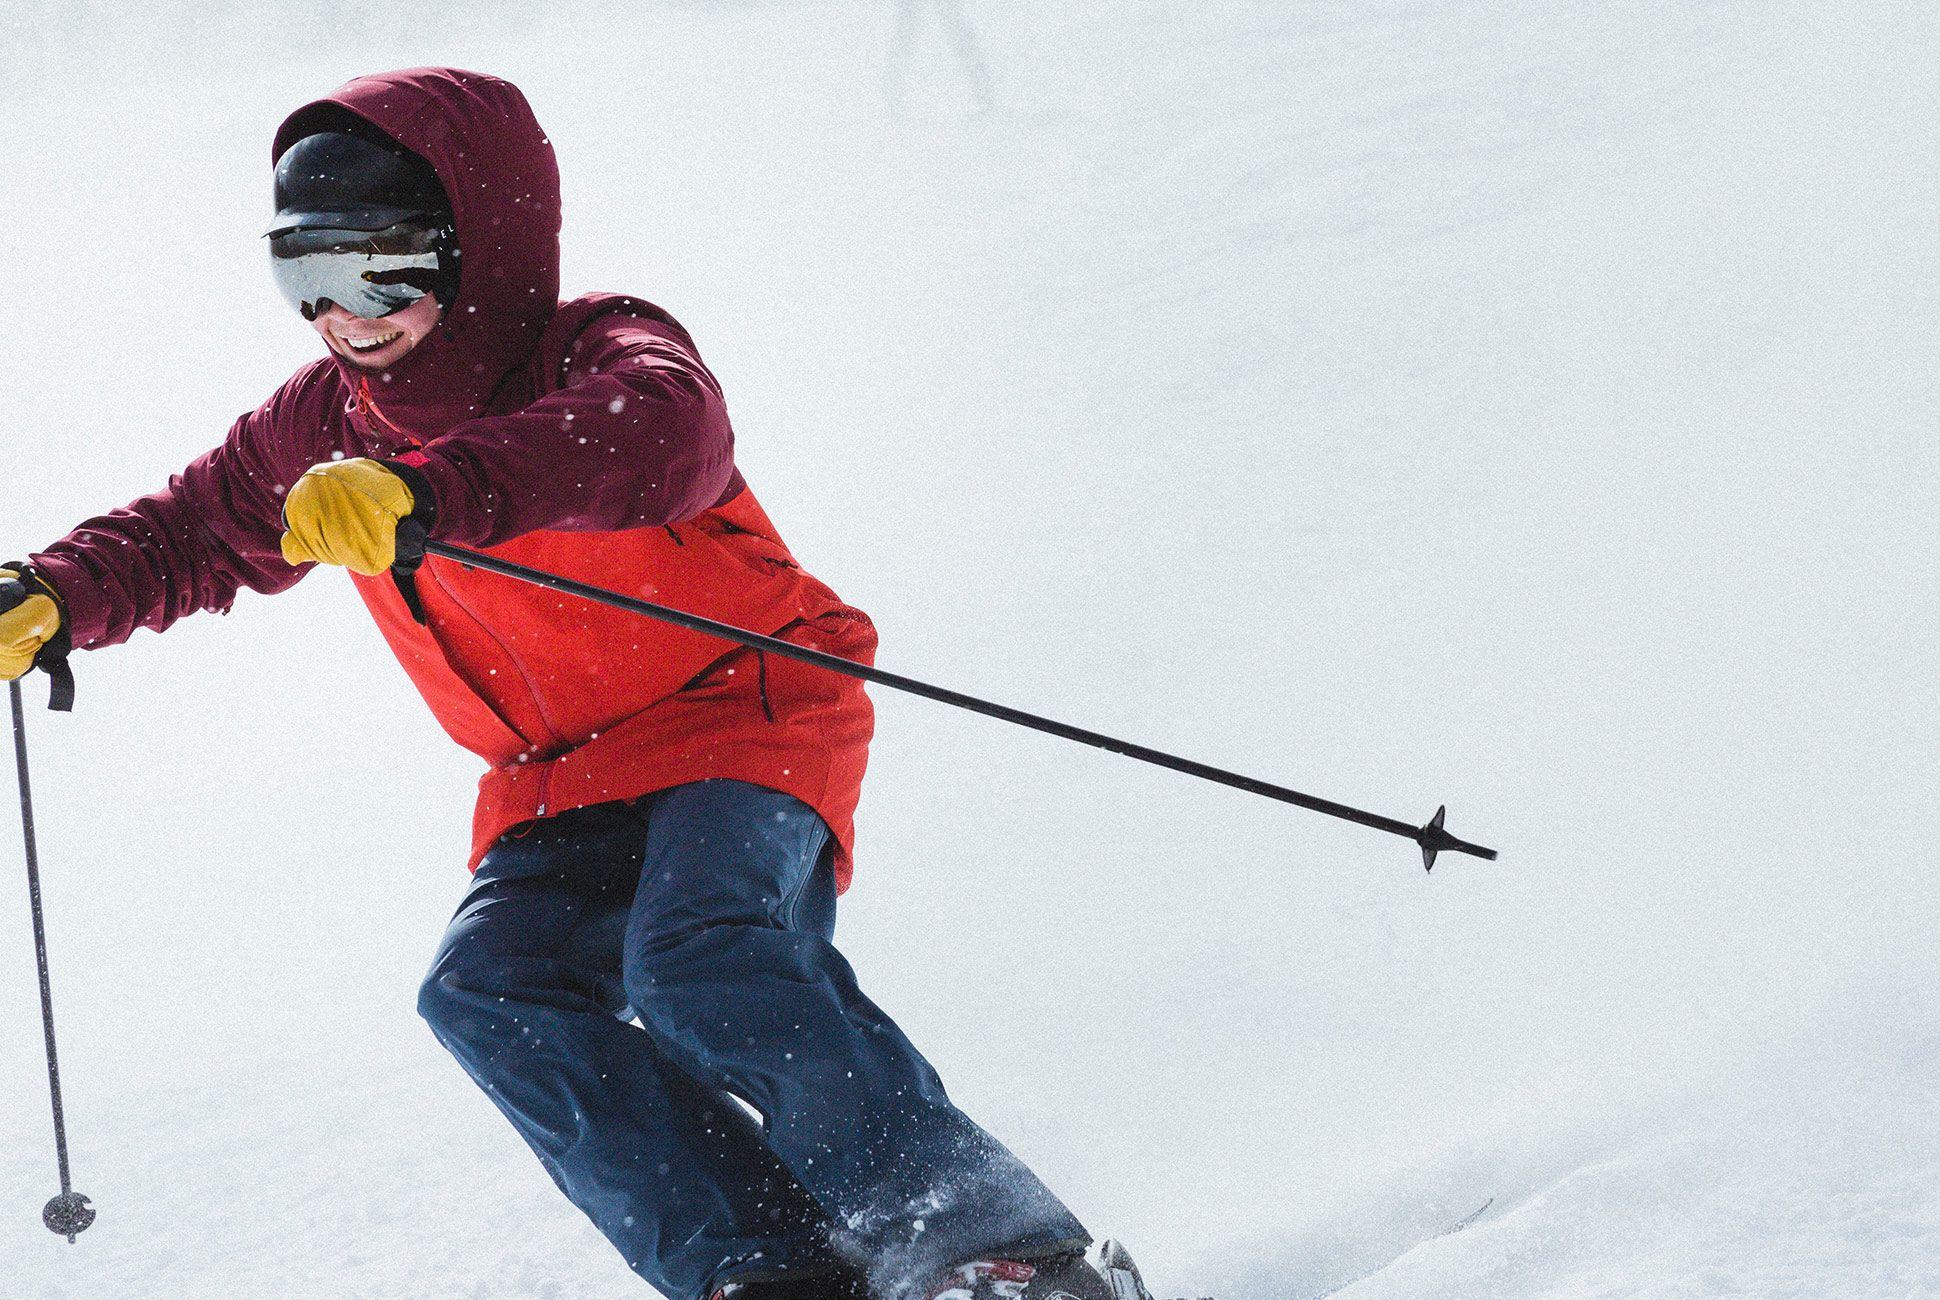 ultimate-ski-and-snow-gear-patrol-strafe-slide-1